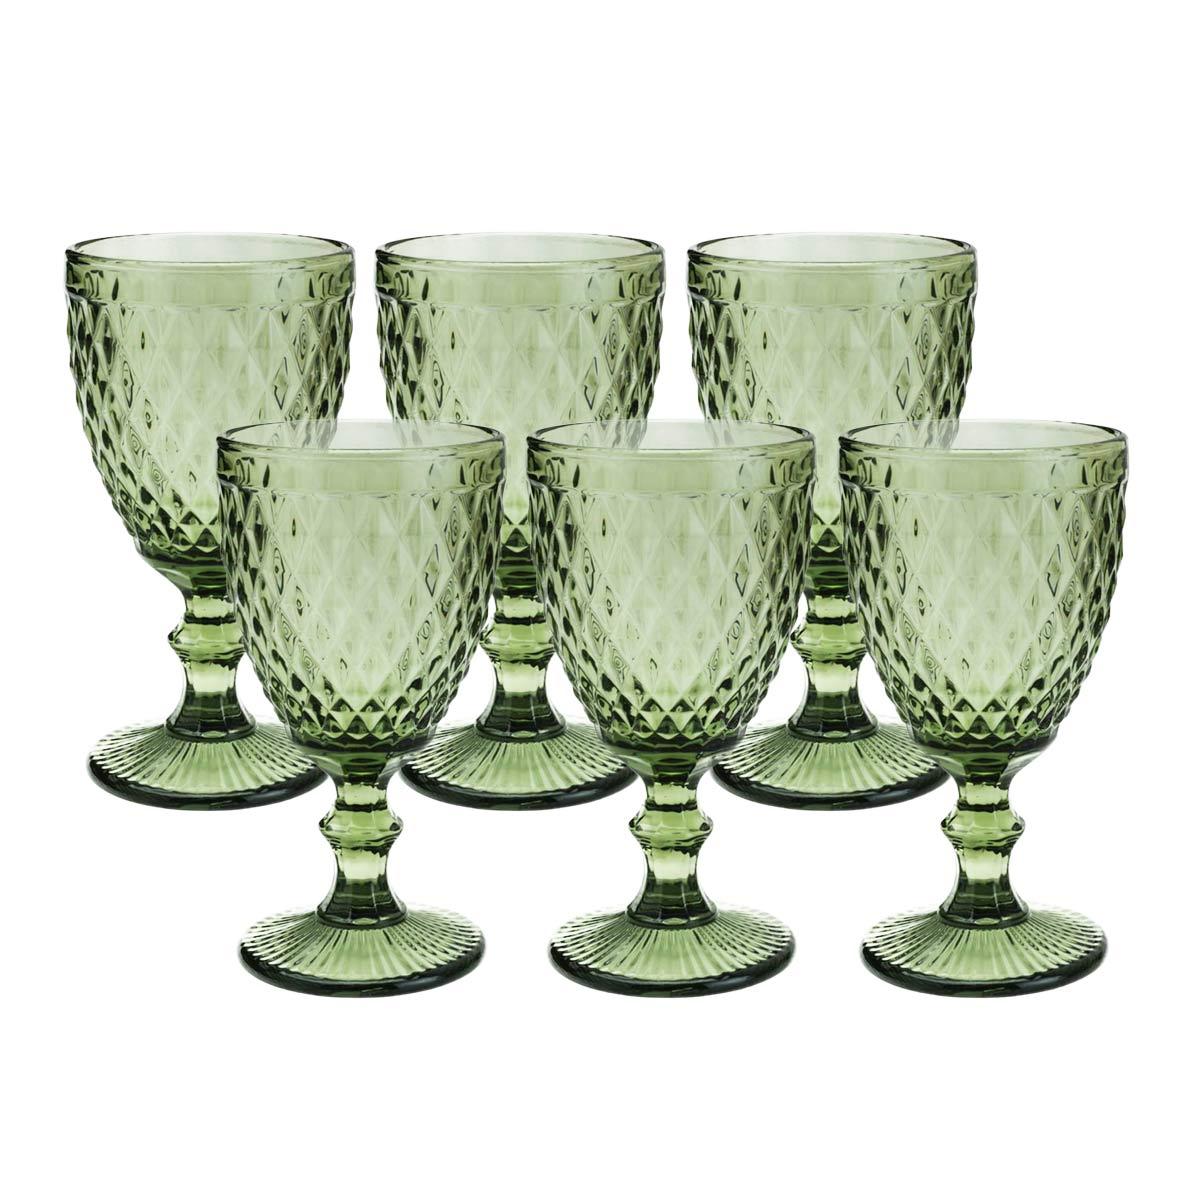 Jogo 6 Taças de Vidro p/Água Lyor Abacaxi 325 ml Verde  - Lemis